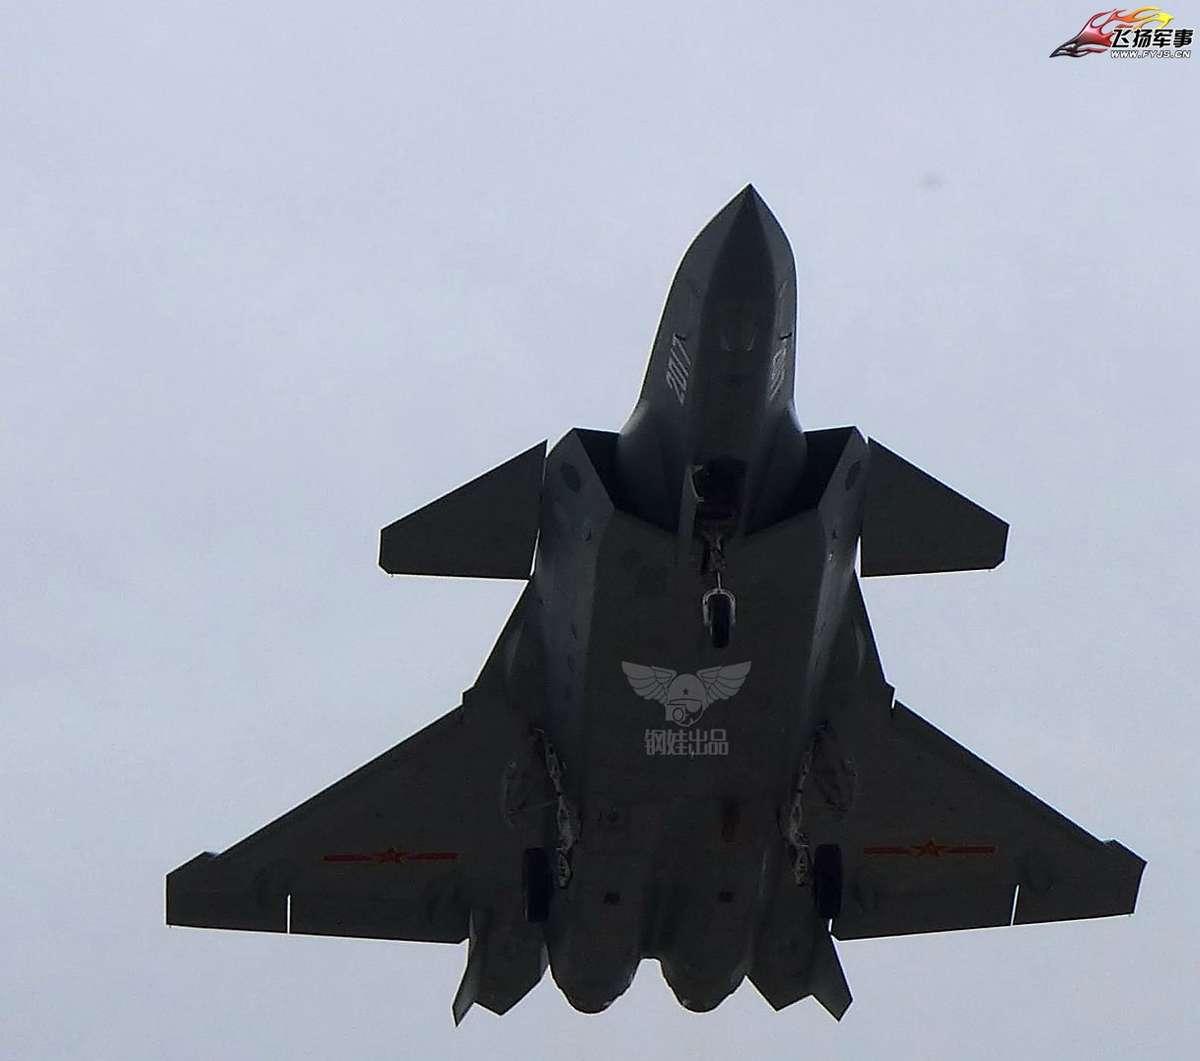 Más detalles del Chengdu J-20 - Página 14 2603891_original